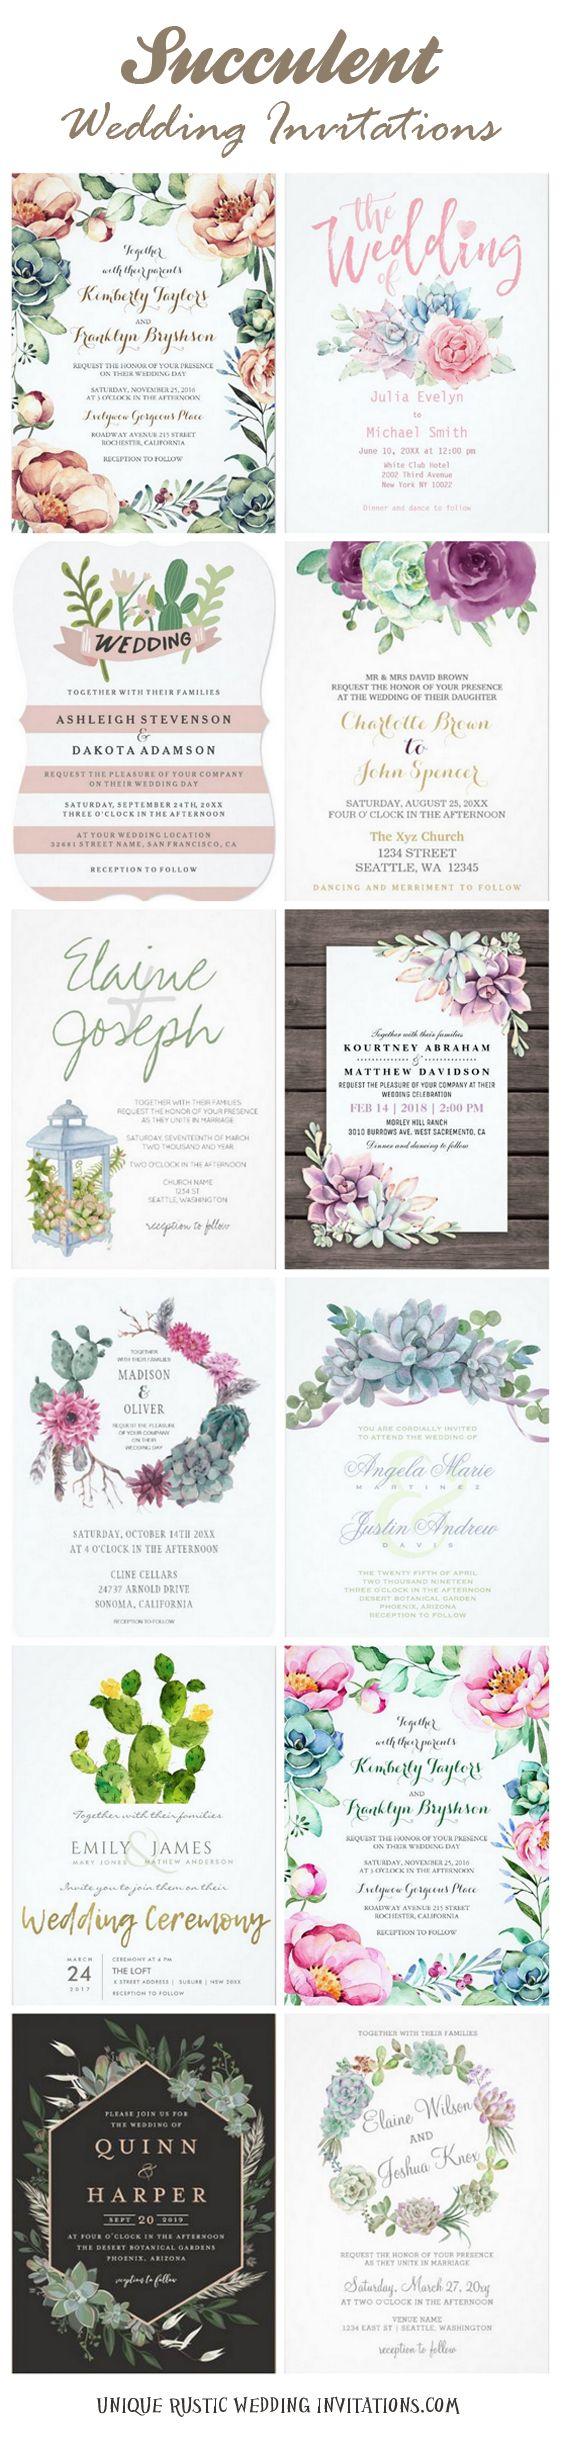 20+ Succulent wedding invitations #rusticwedding